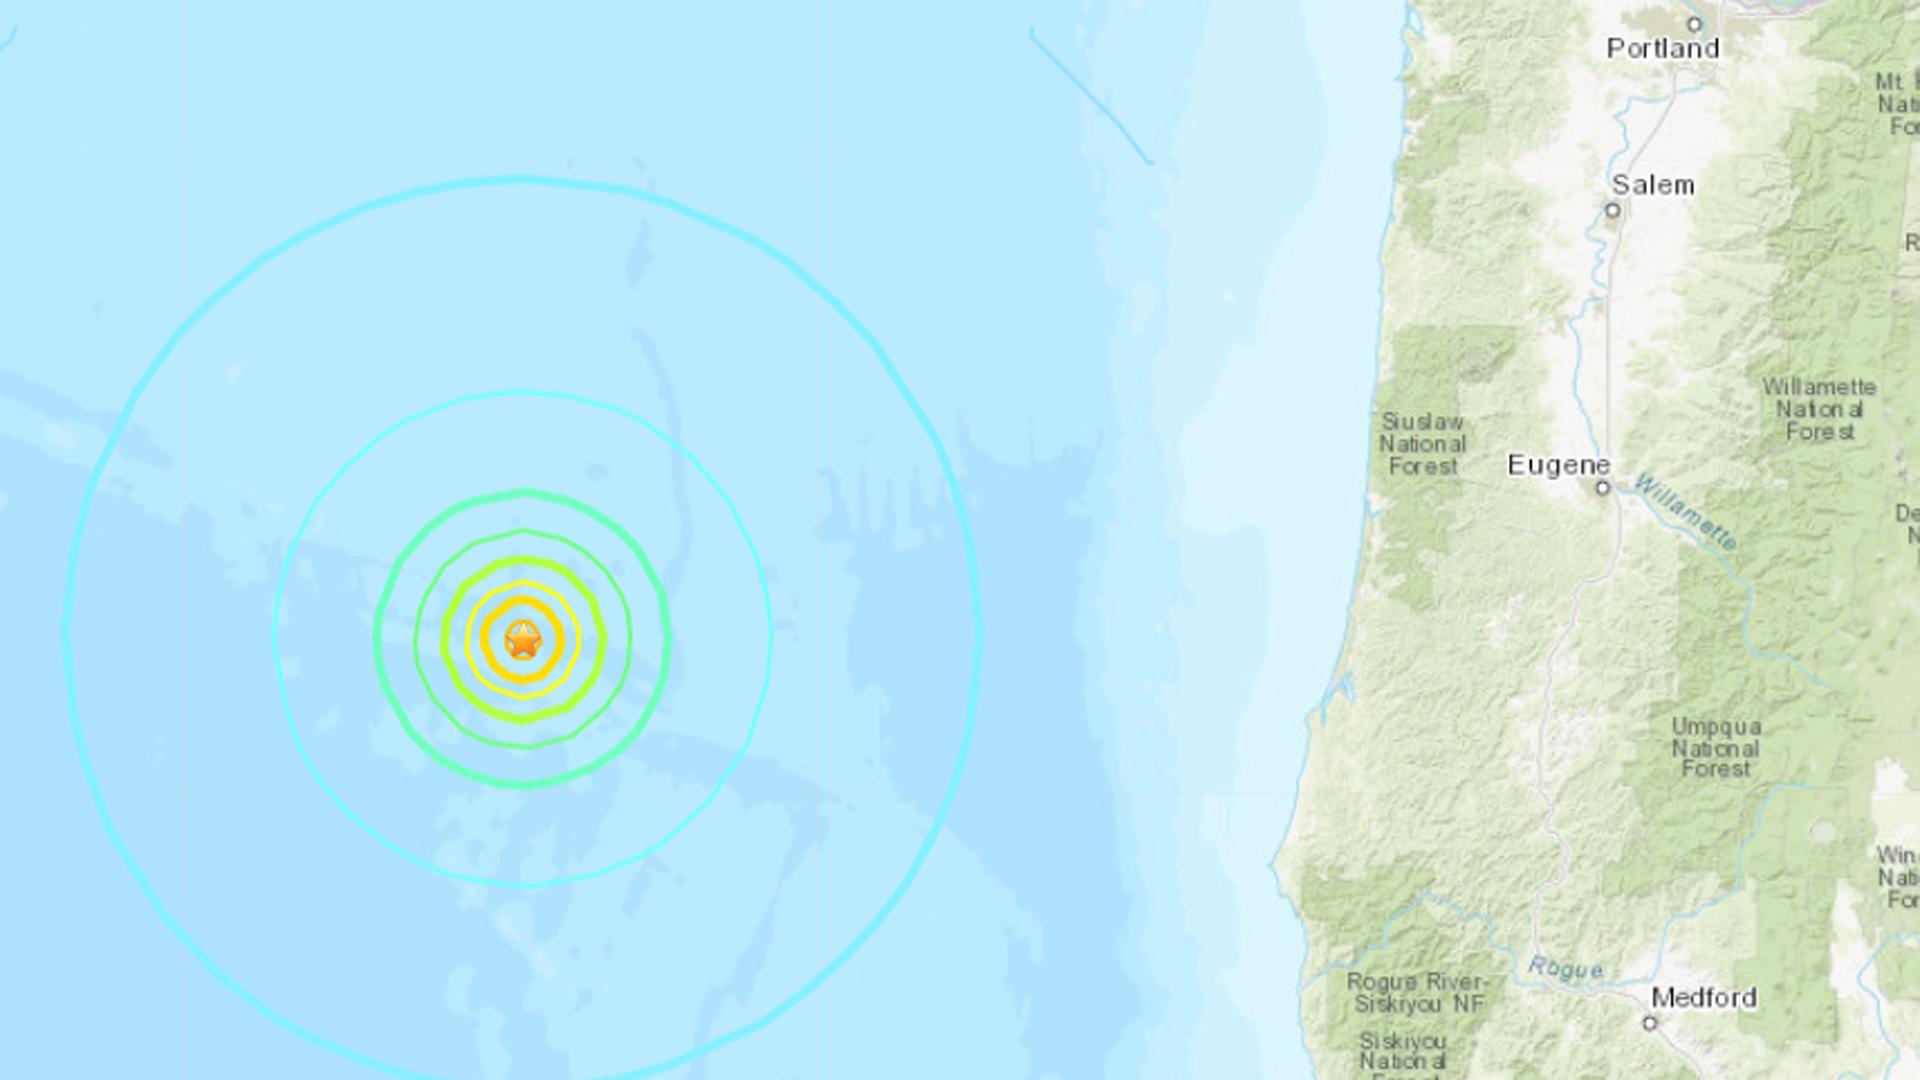 A 6.3 earthquake struck off the Oregon coastline on Aug. 29, 2019. (Credit: USGS)